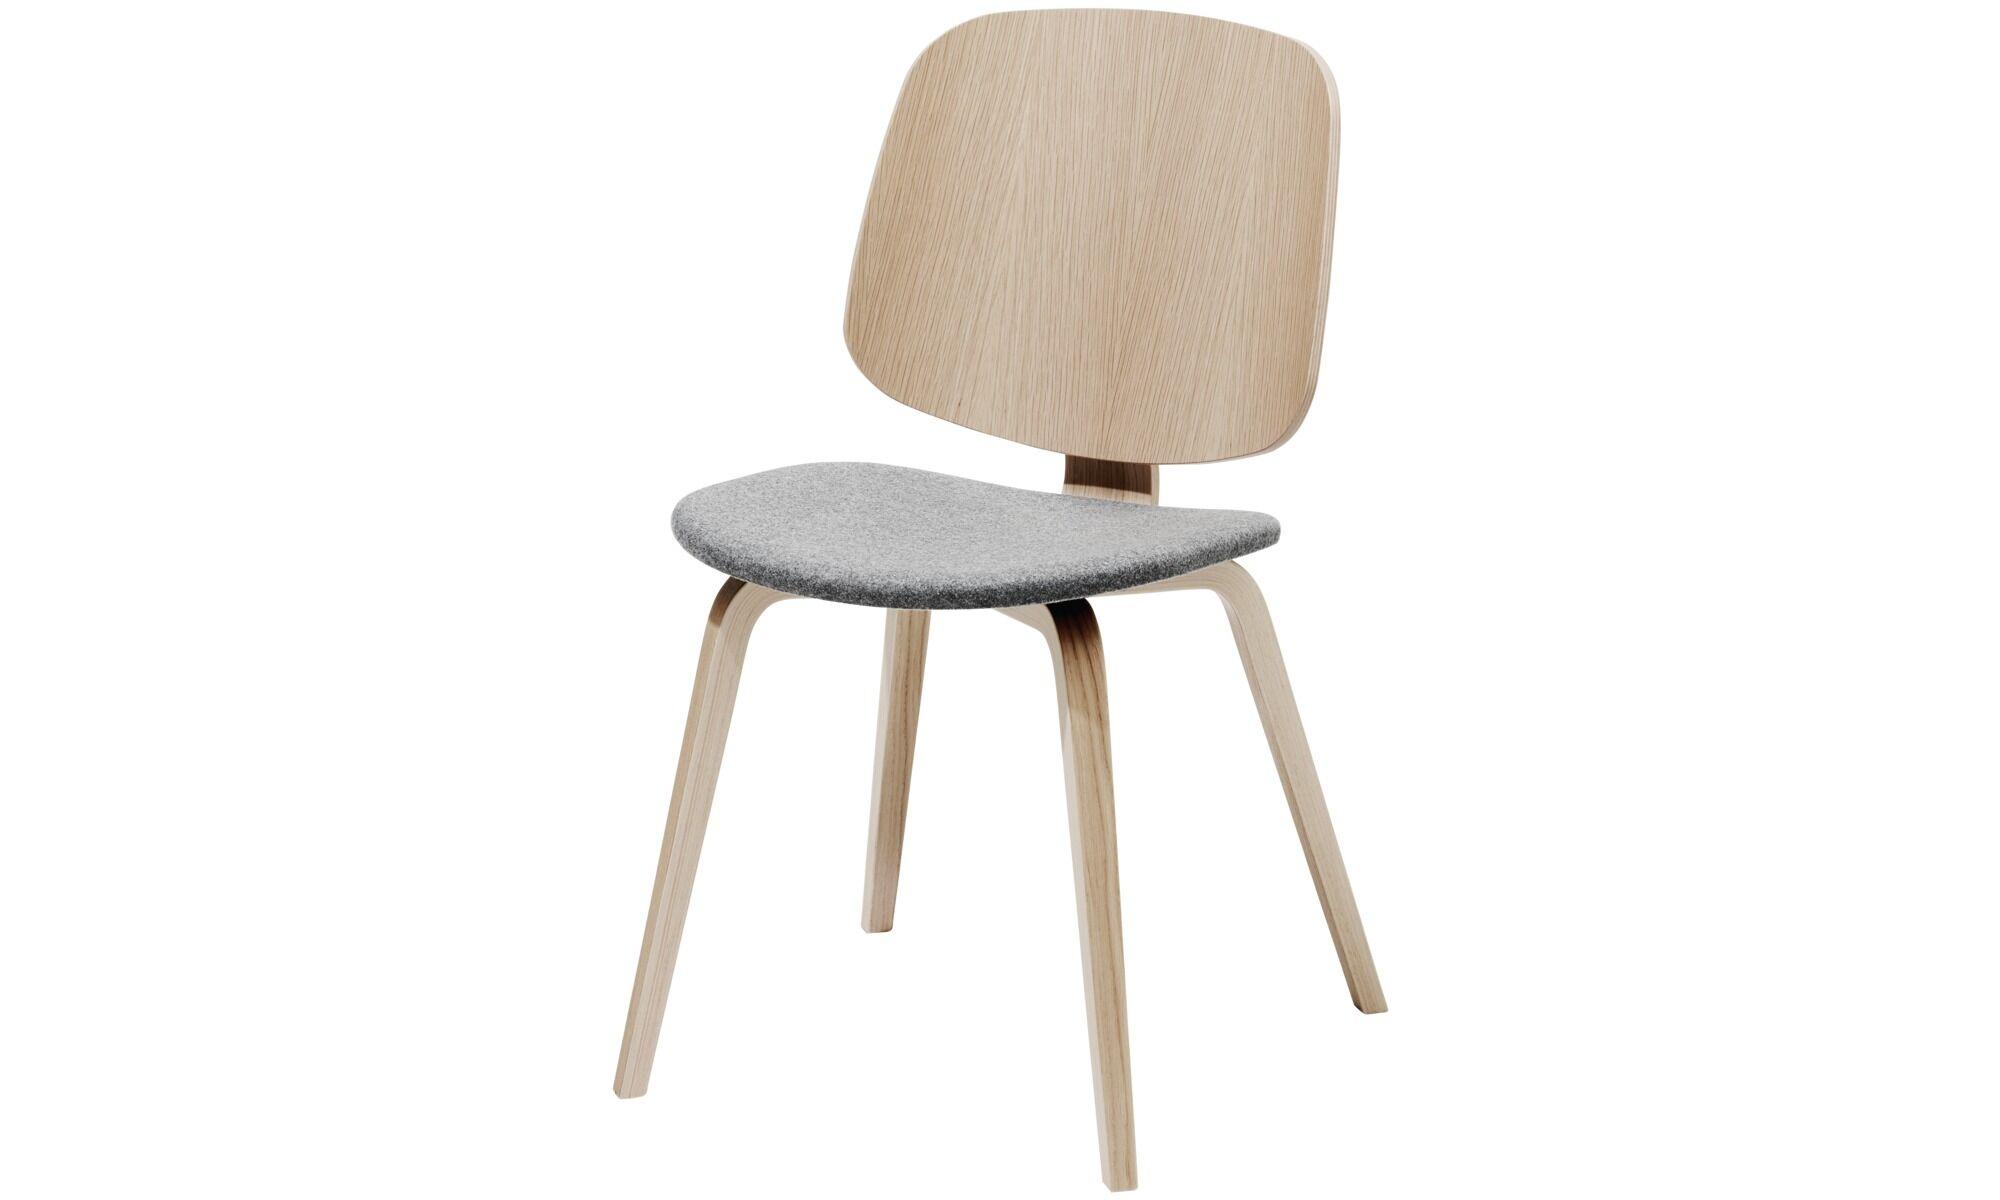 Aarhus Stuhl (3 Stück verfügbar)